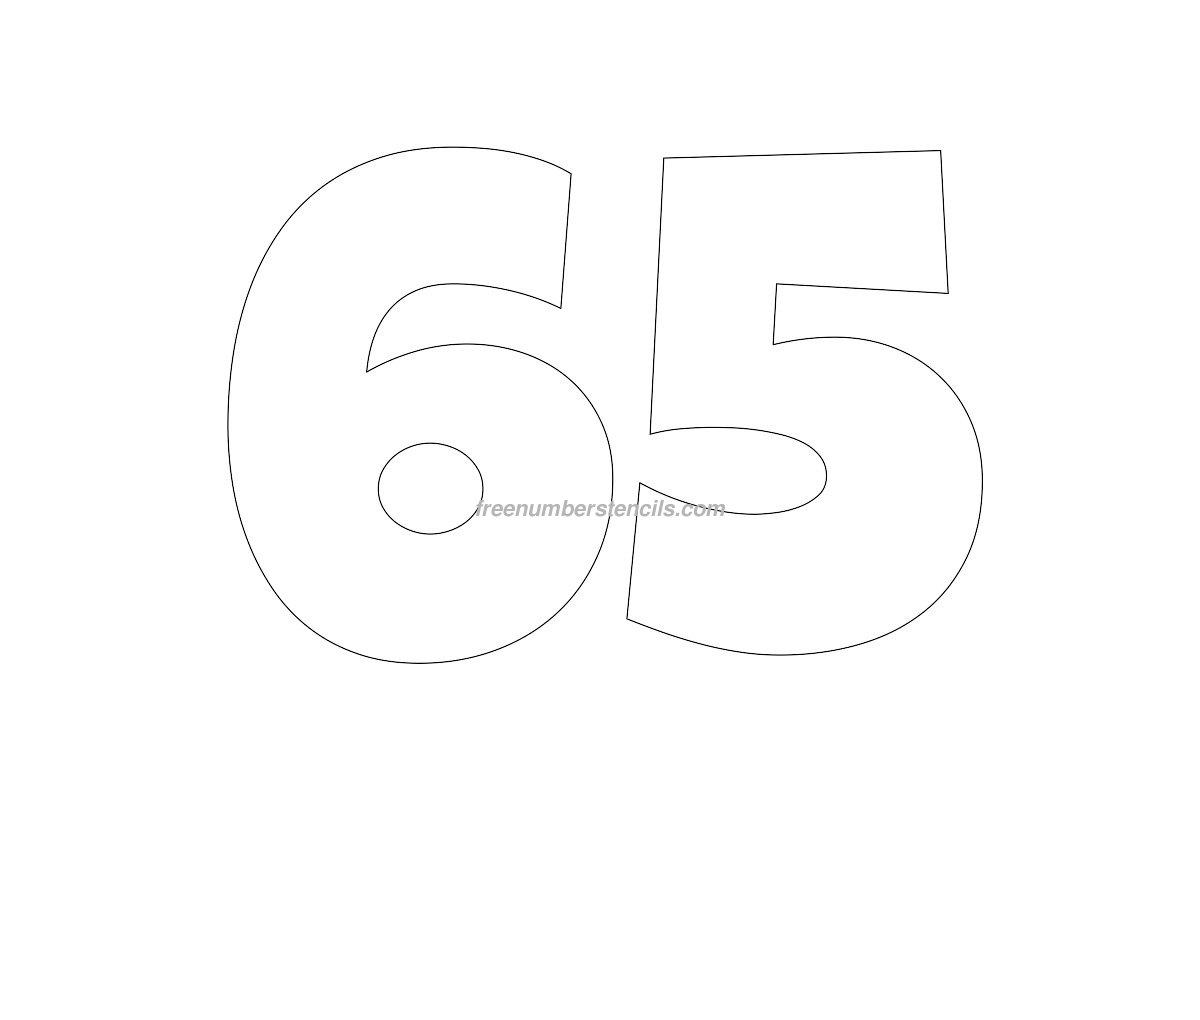 Free Giant 65 Number Stencil Freenumberstencils Com